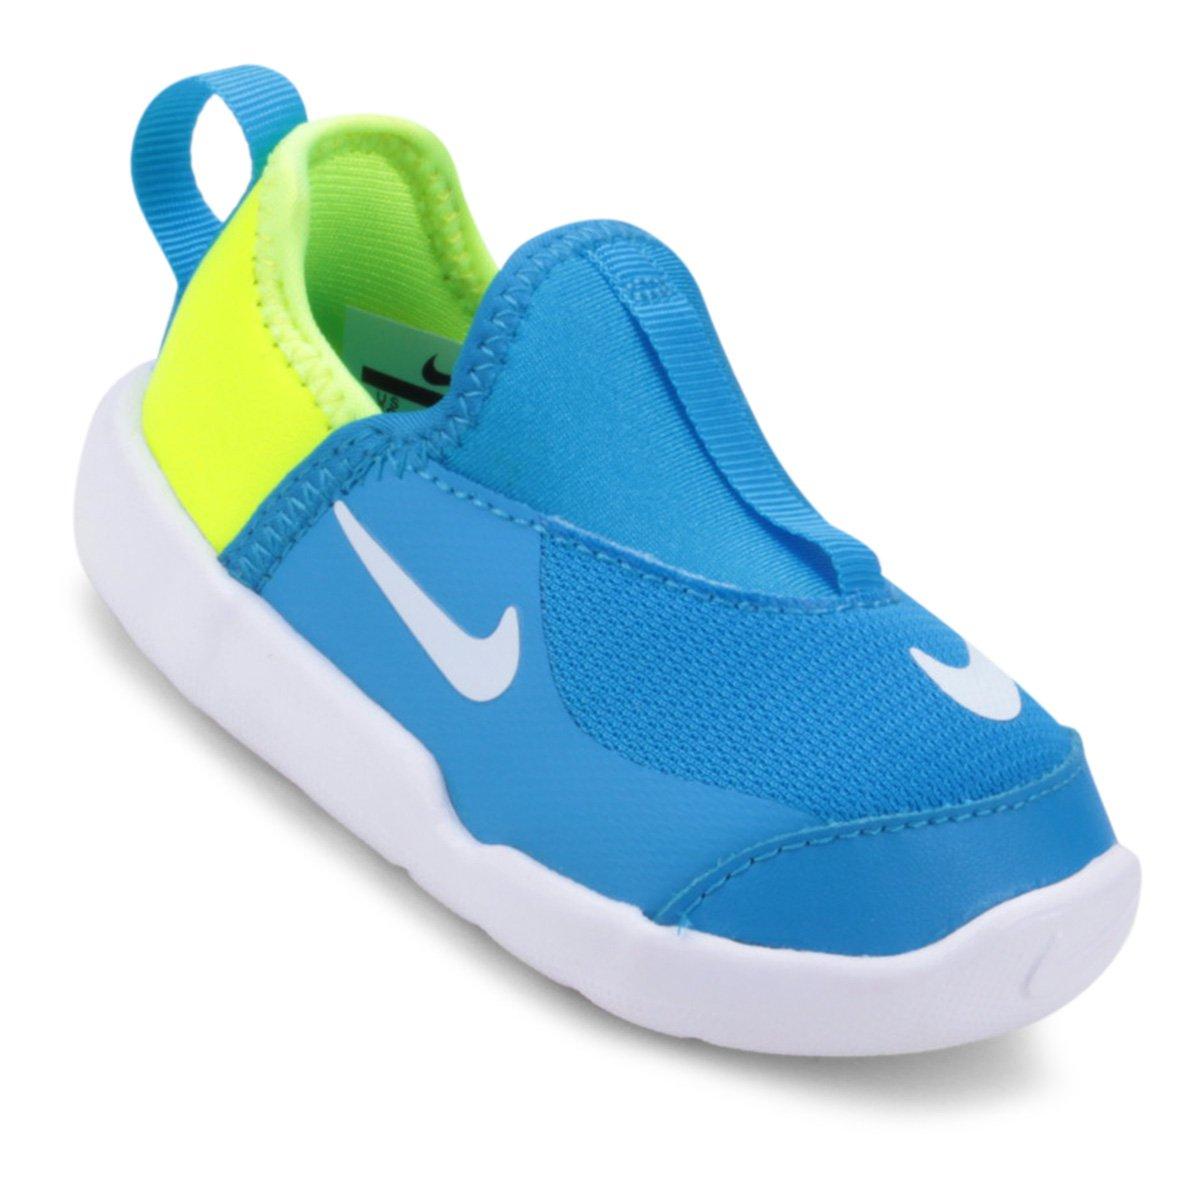 a63c39abd5f Tênis Infantil Nike Lil  Swoosh Masculino - Azul e Branco - Compre Agora